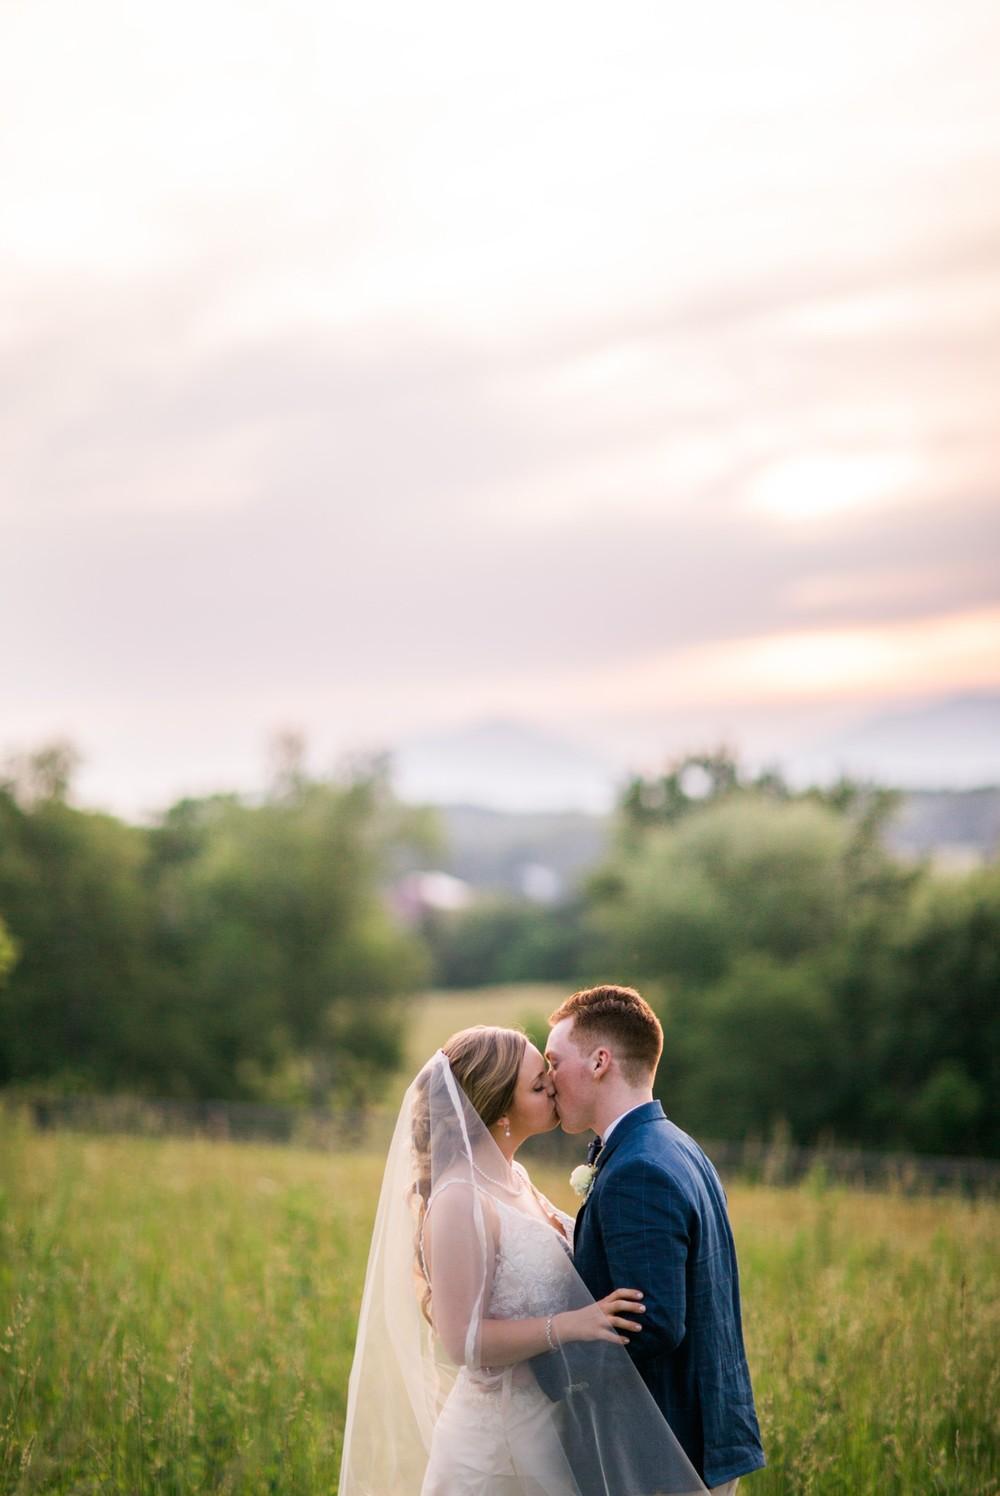 trivium_lynchburg_va_wedding_estate_wedding_photography_wedding_photographers (78).jpg